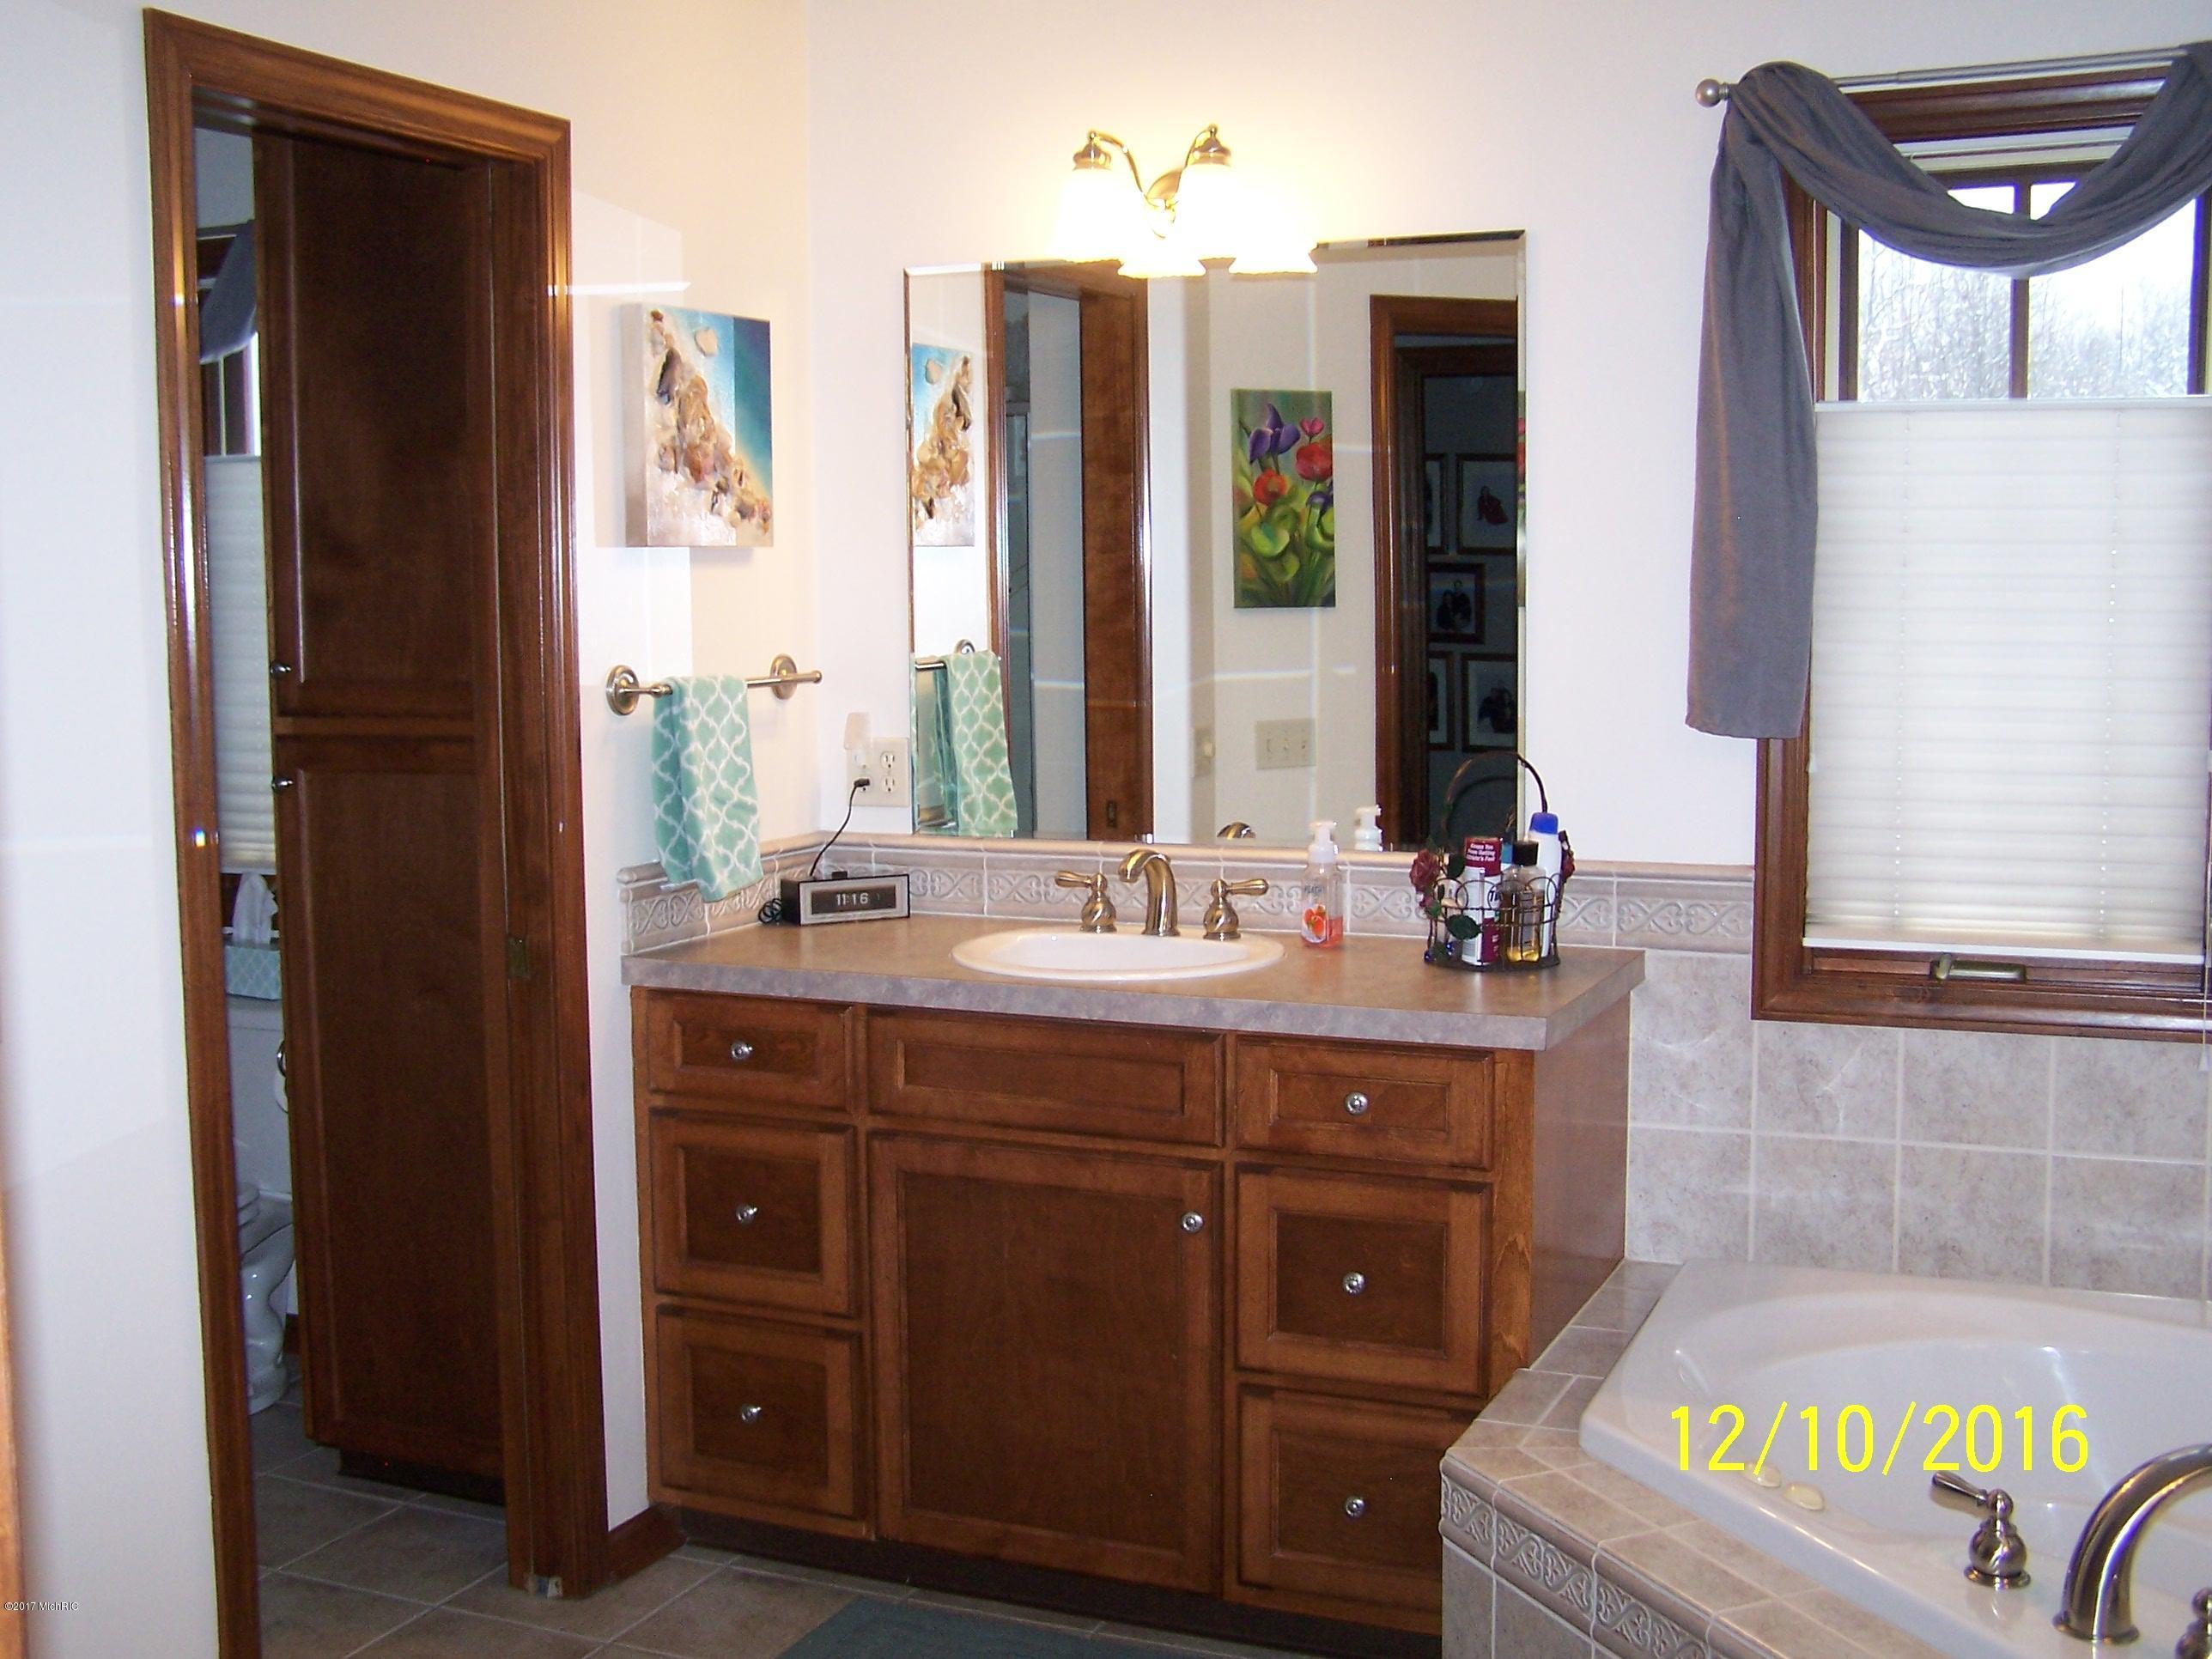 Bathroom Cabinets Grand Rapids Mi 283 kara sw, grand rapids, mi, 49534 - sold listing, mls